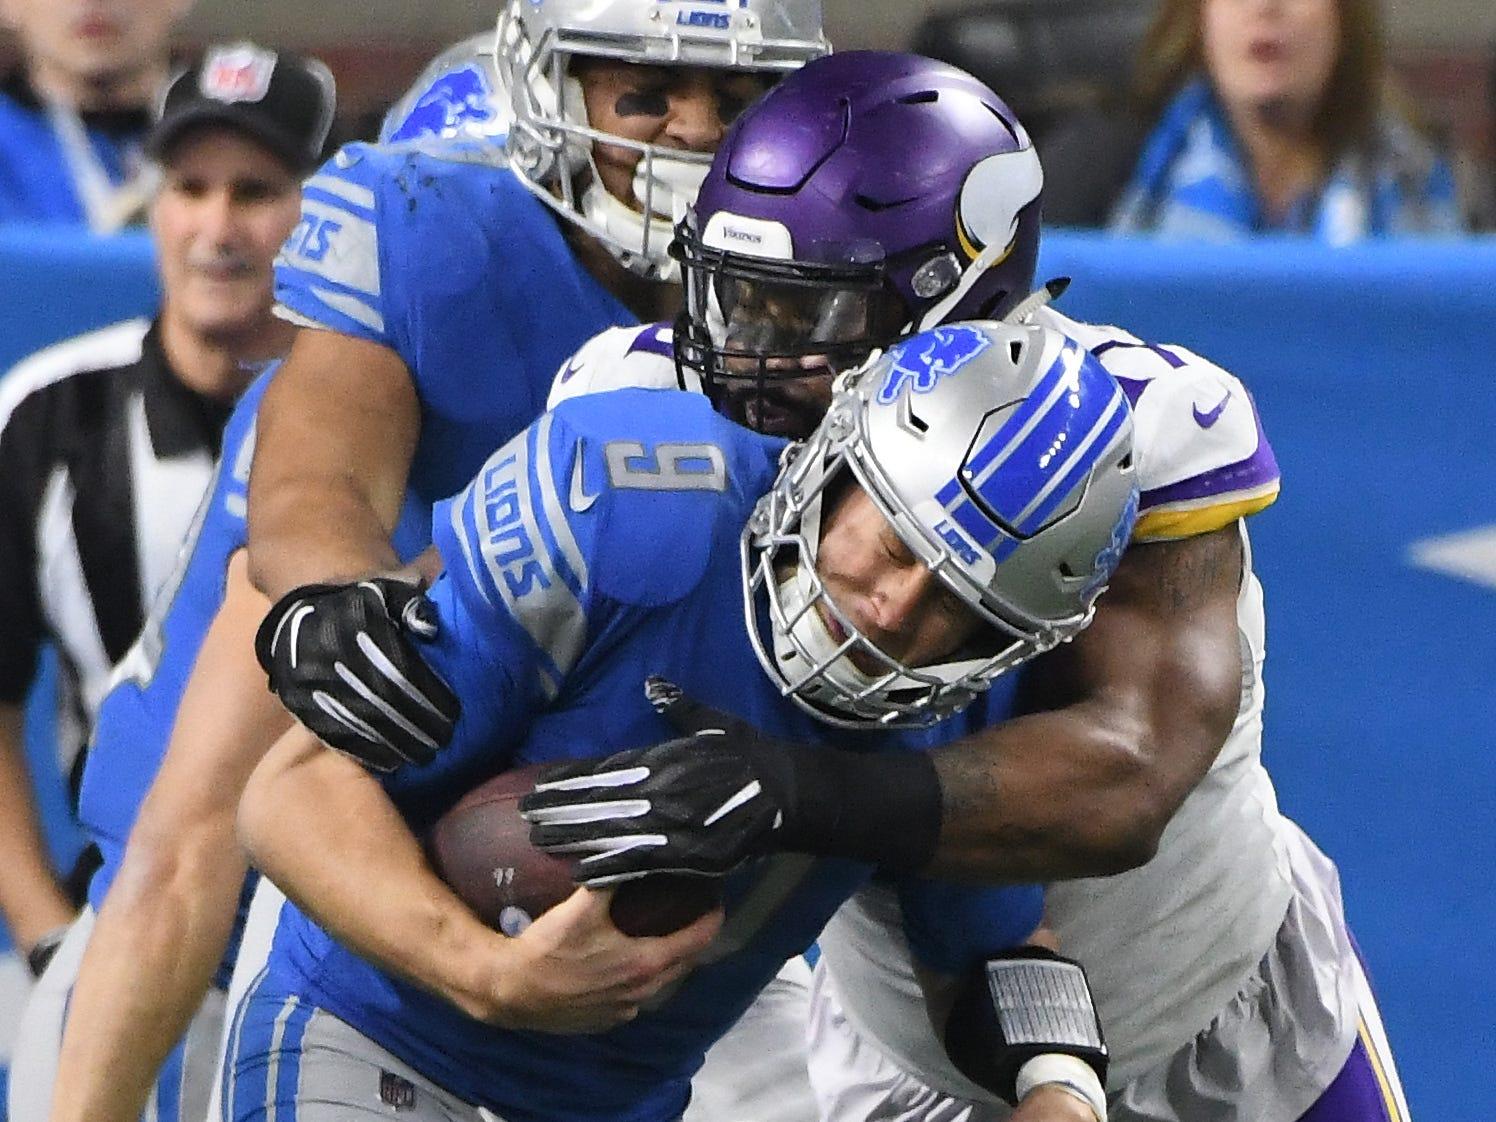 Lions quarterback Matt Stafford is sacked by Vikings' Jaleel Johnson in the third quarter.